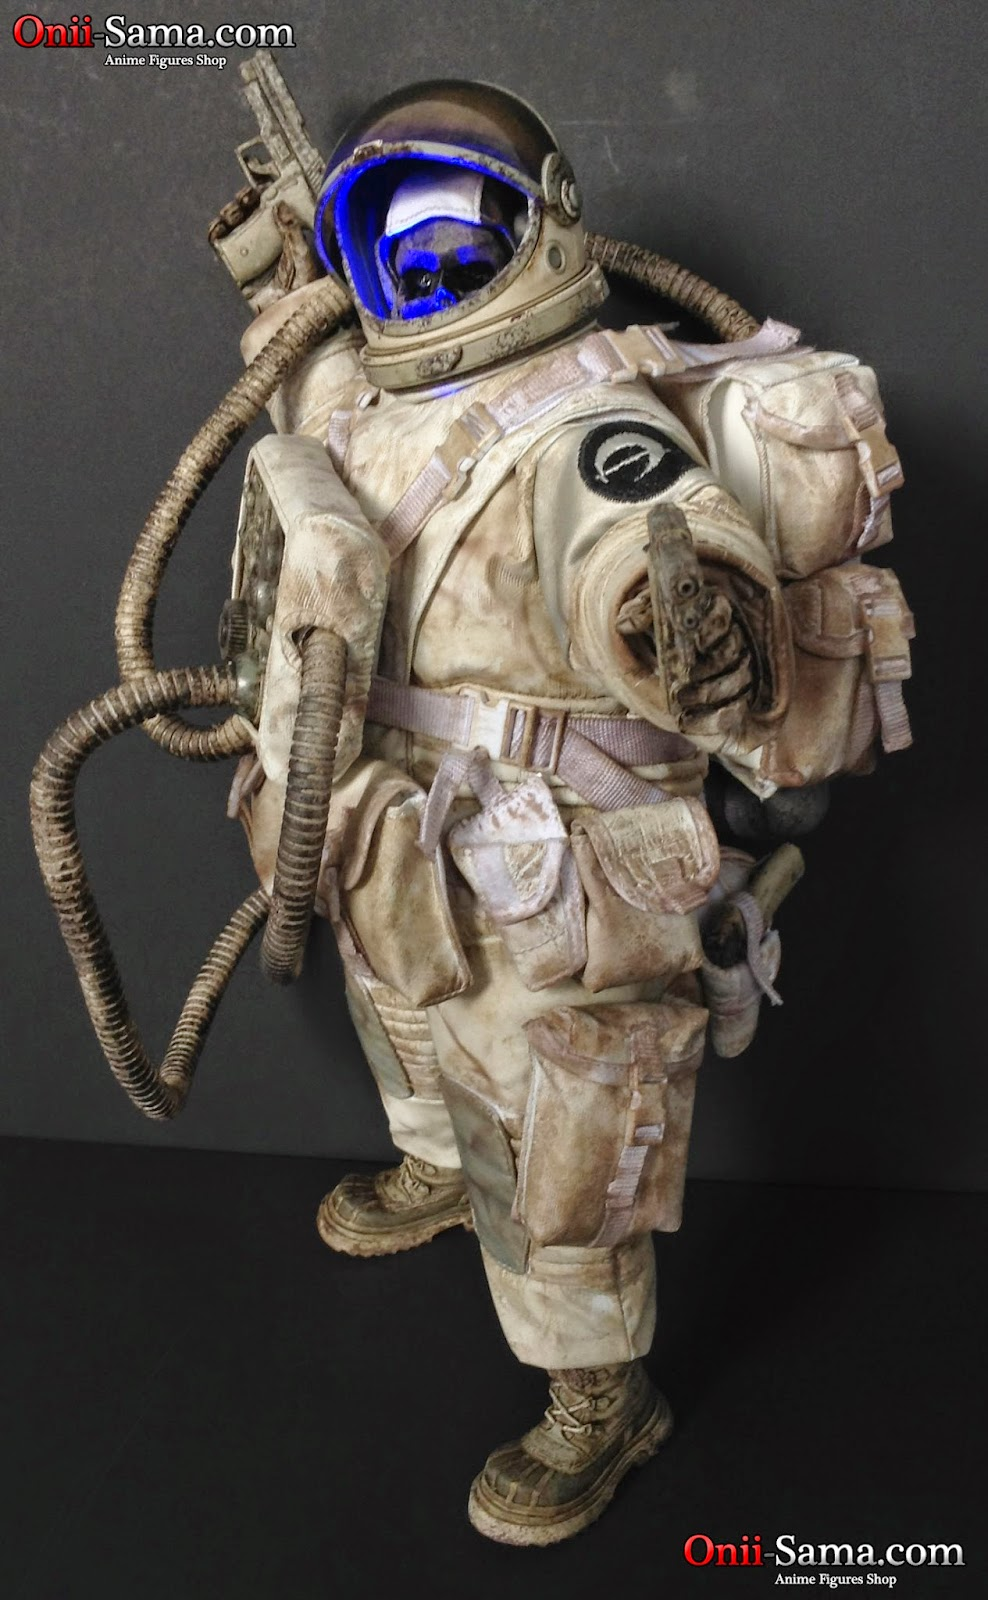 astronaut statue spokane - photo #24